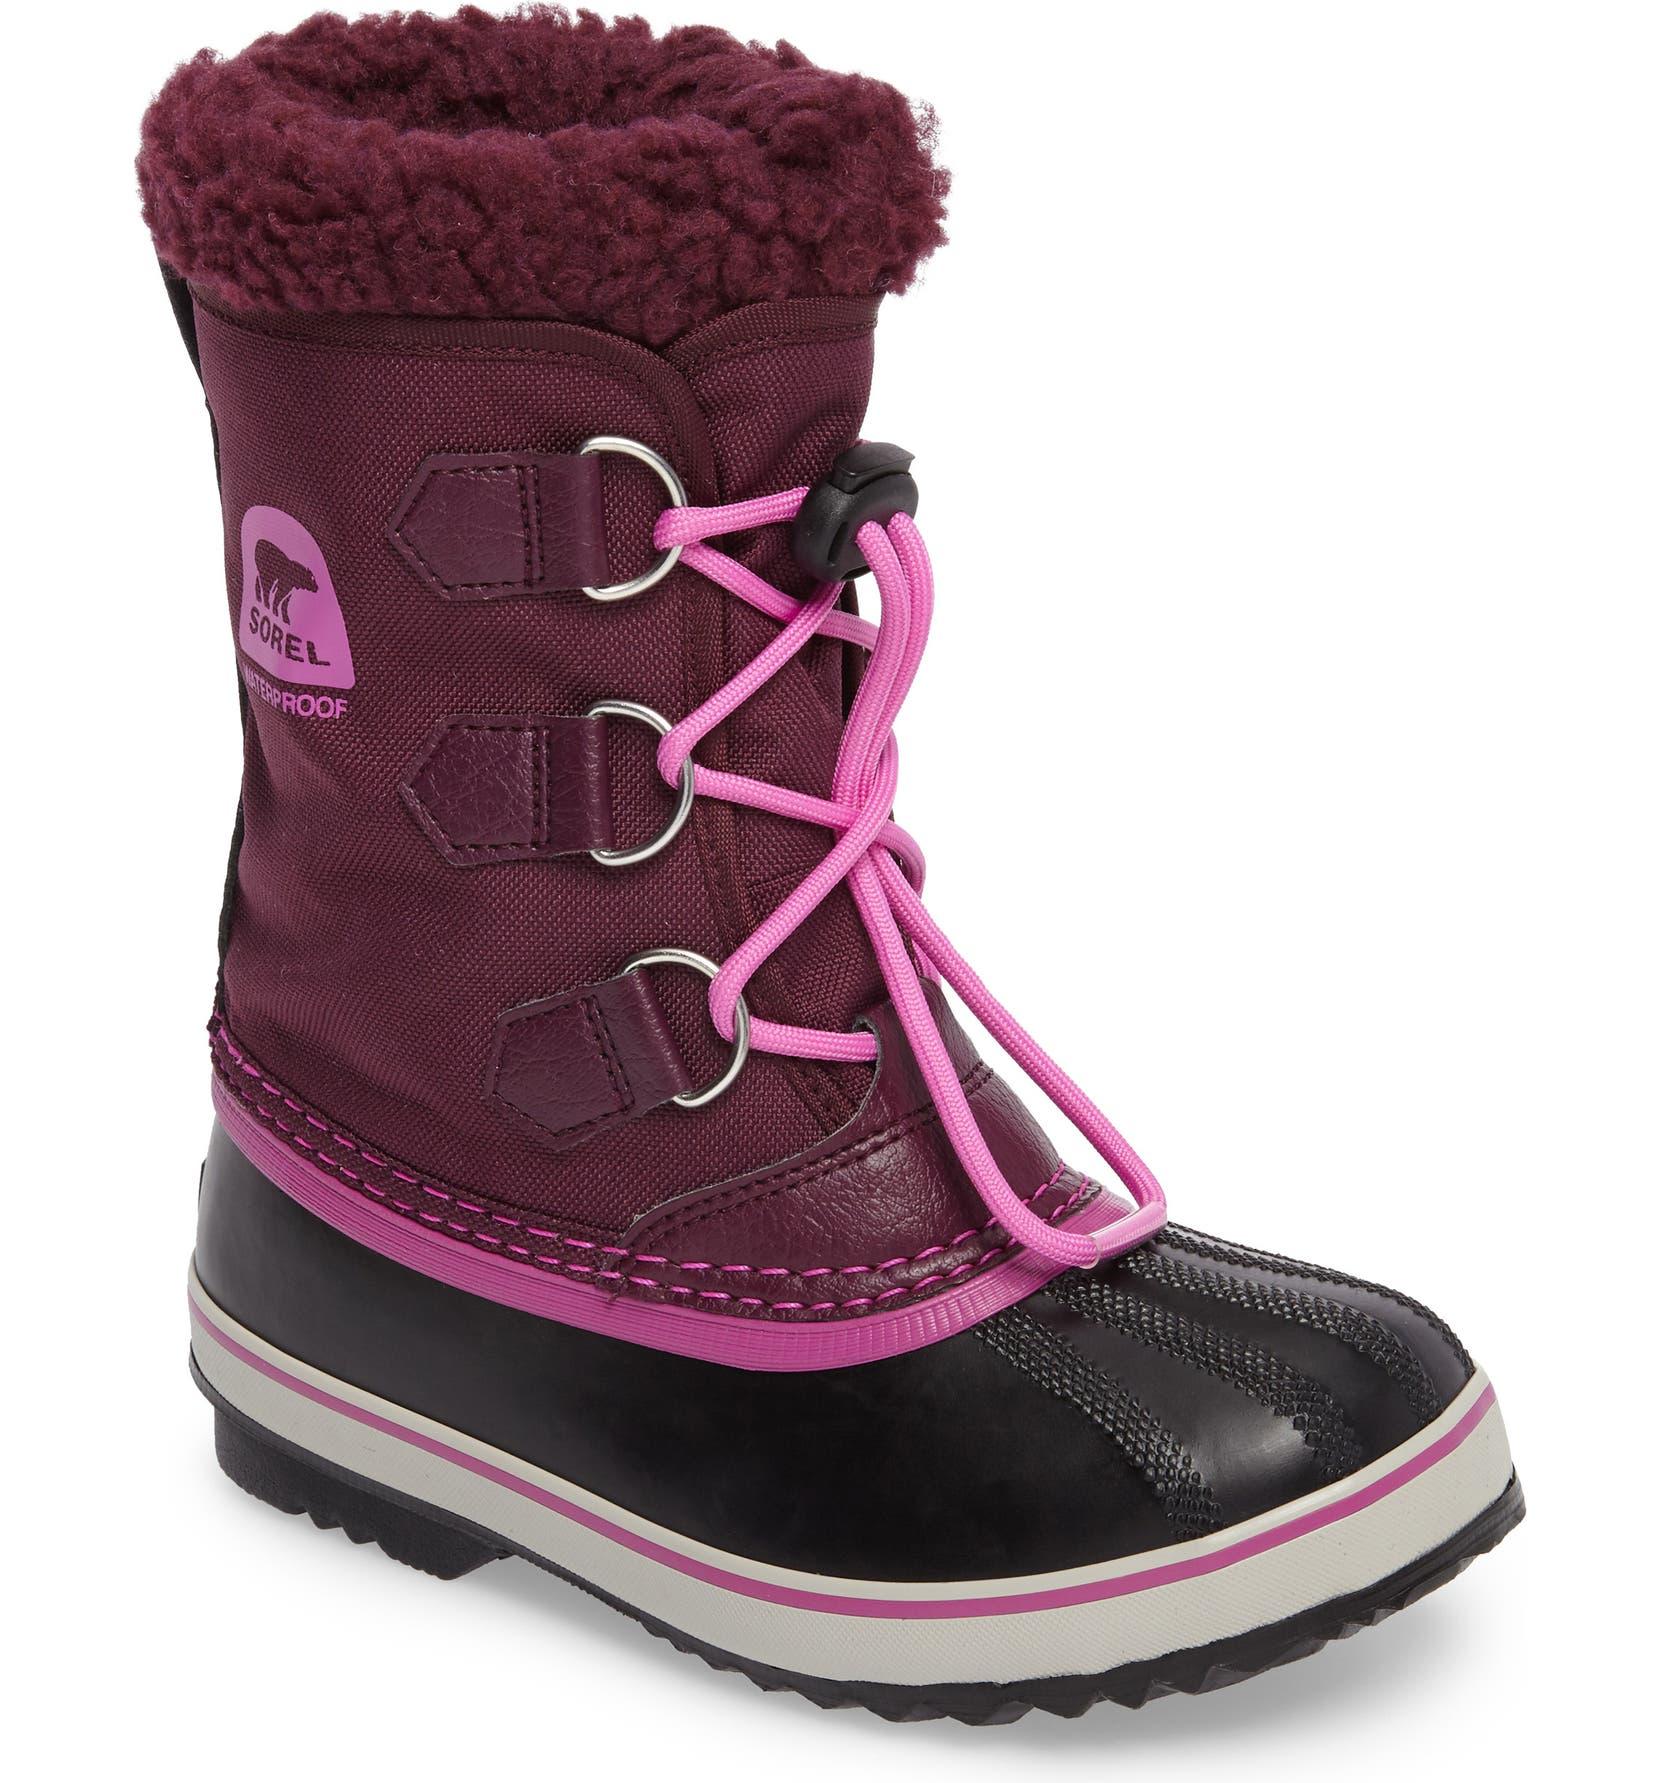 09d01c5602b SOREL 'Yoot Pac' Waterproof Snow Boot (Toddler, Little Kid & Big Kid) |  Nordstrom